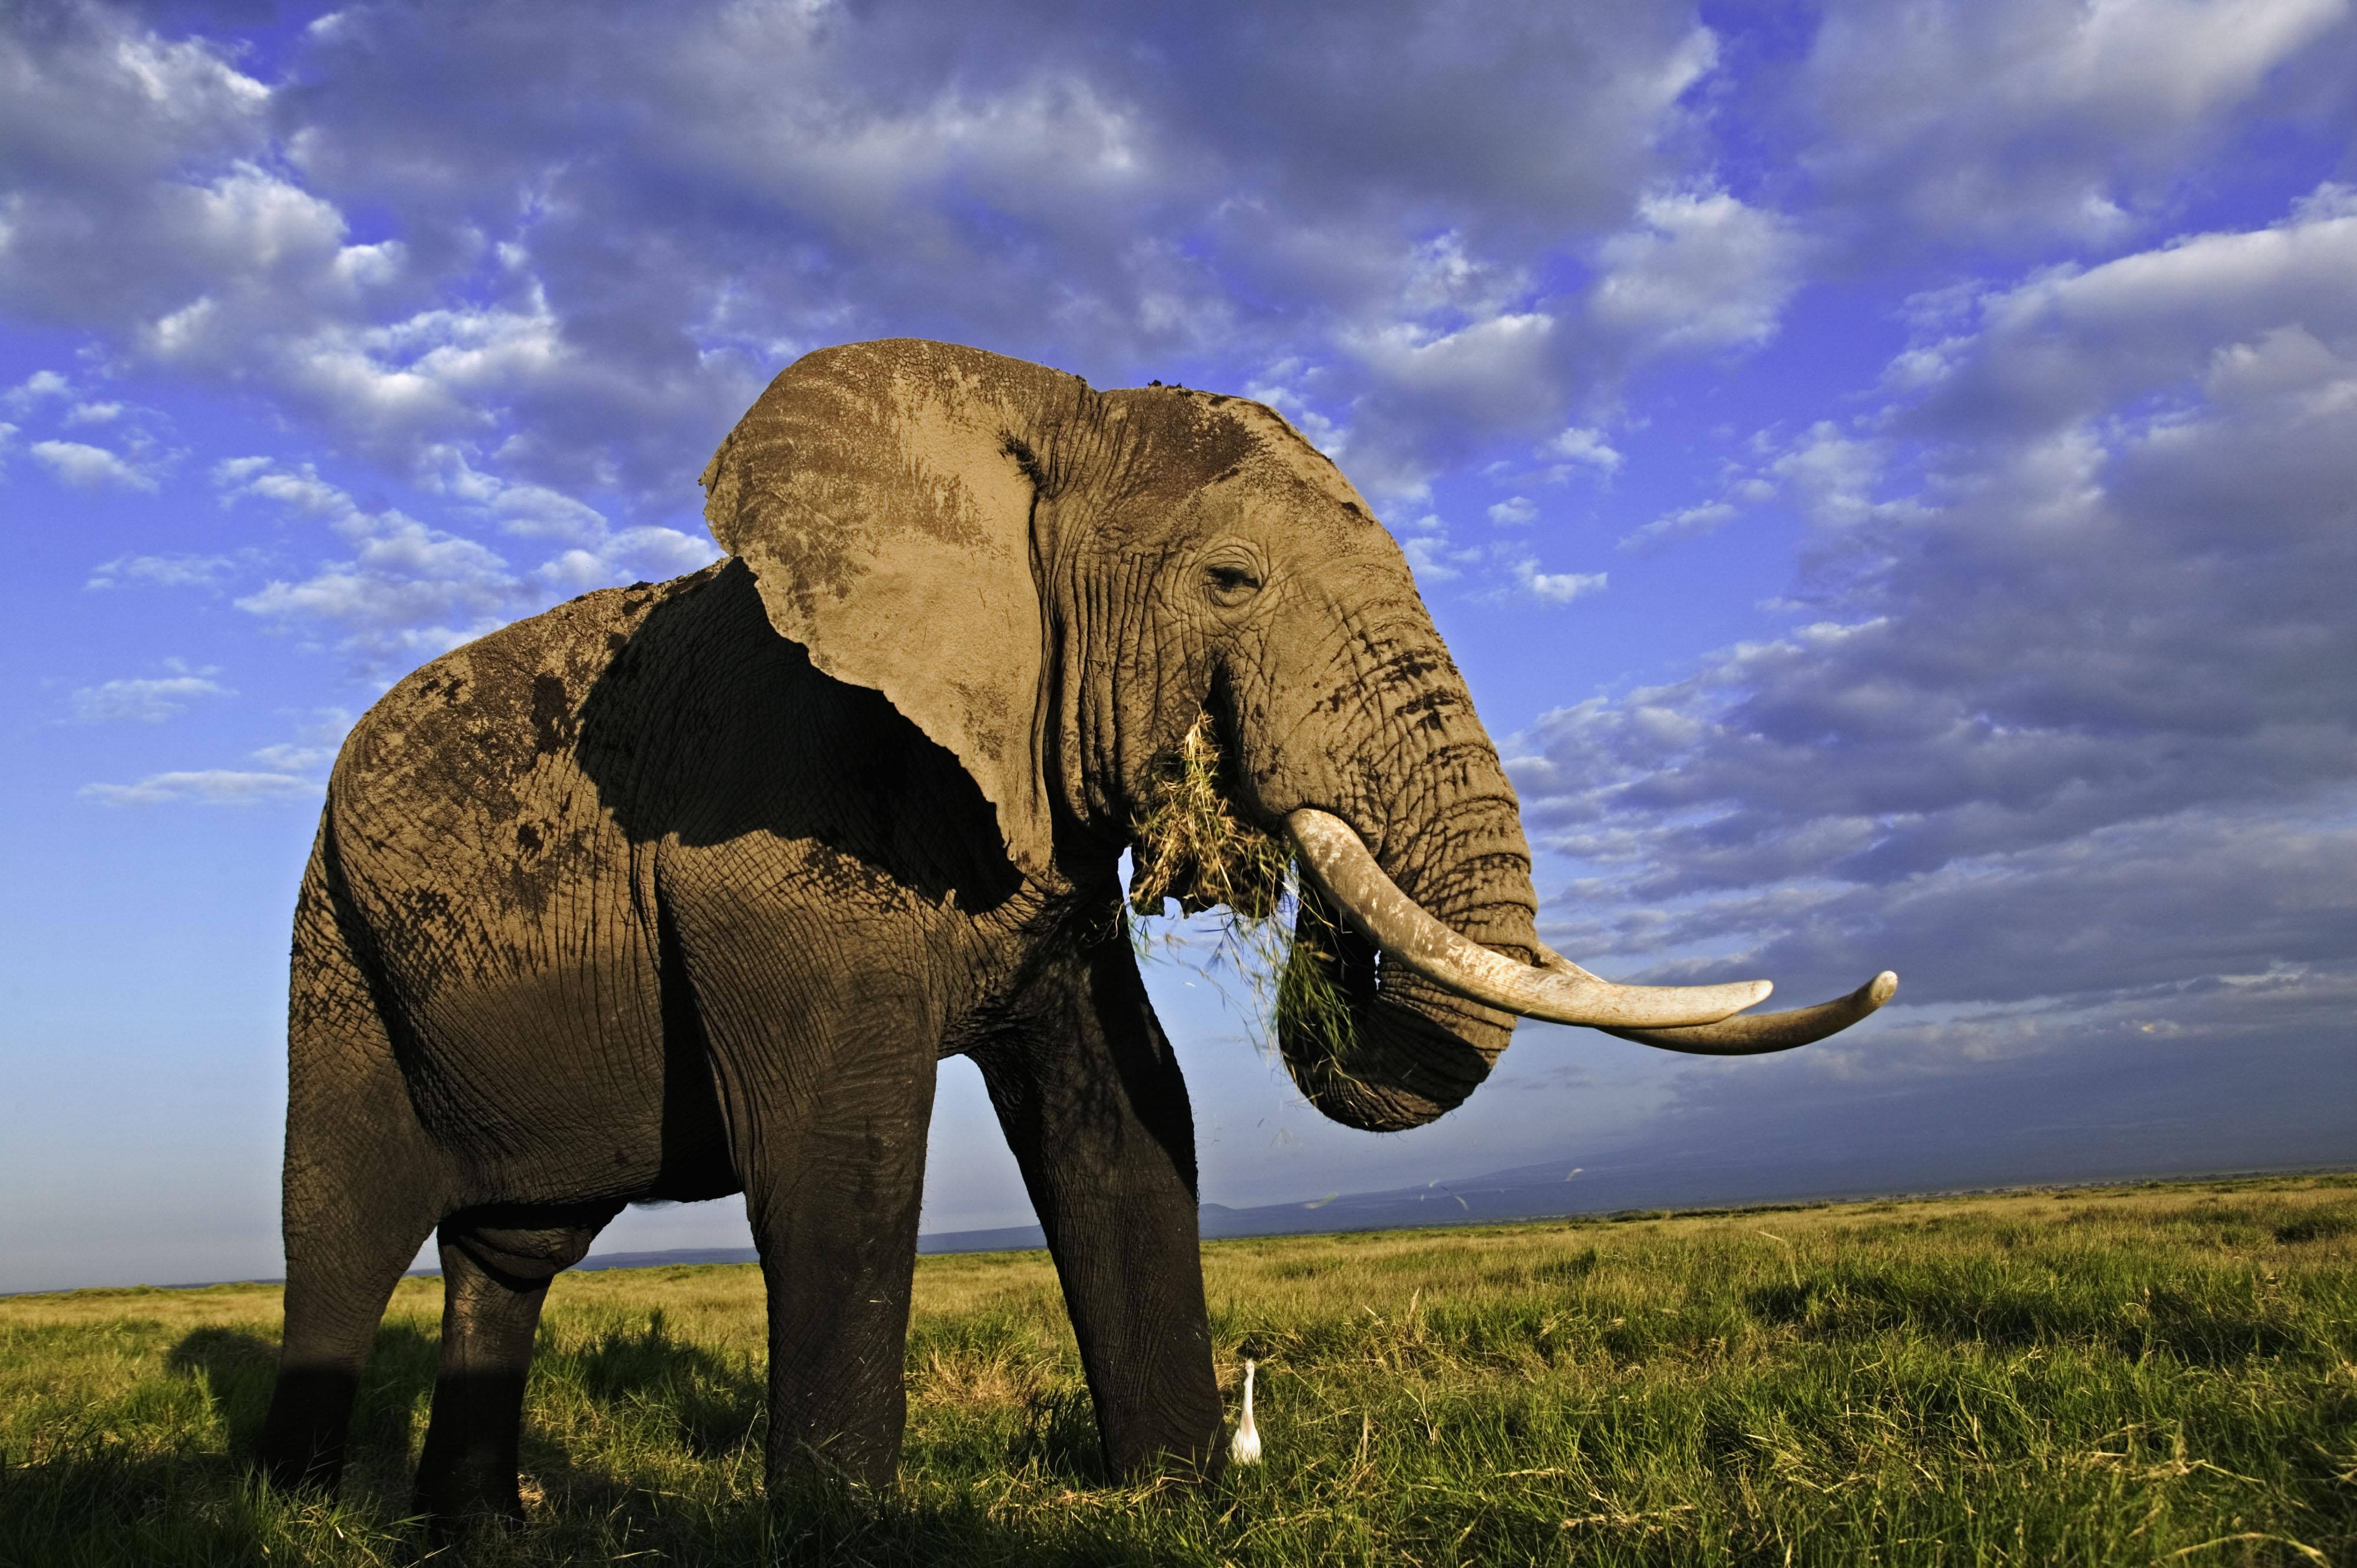 African elephant Amboseli National Park, Kenya. Distribution Sub-Saharan Africa